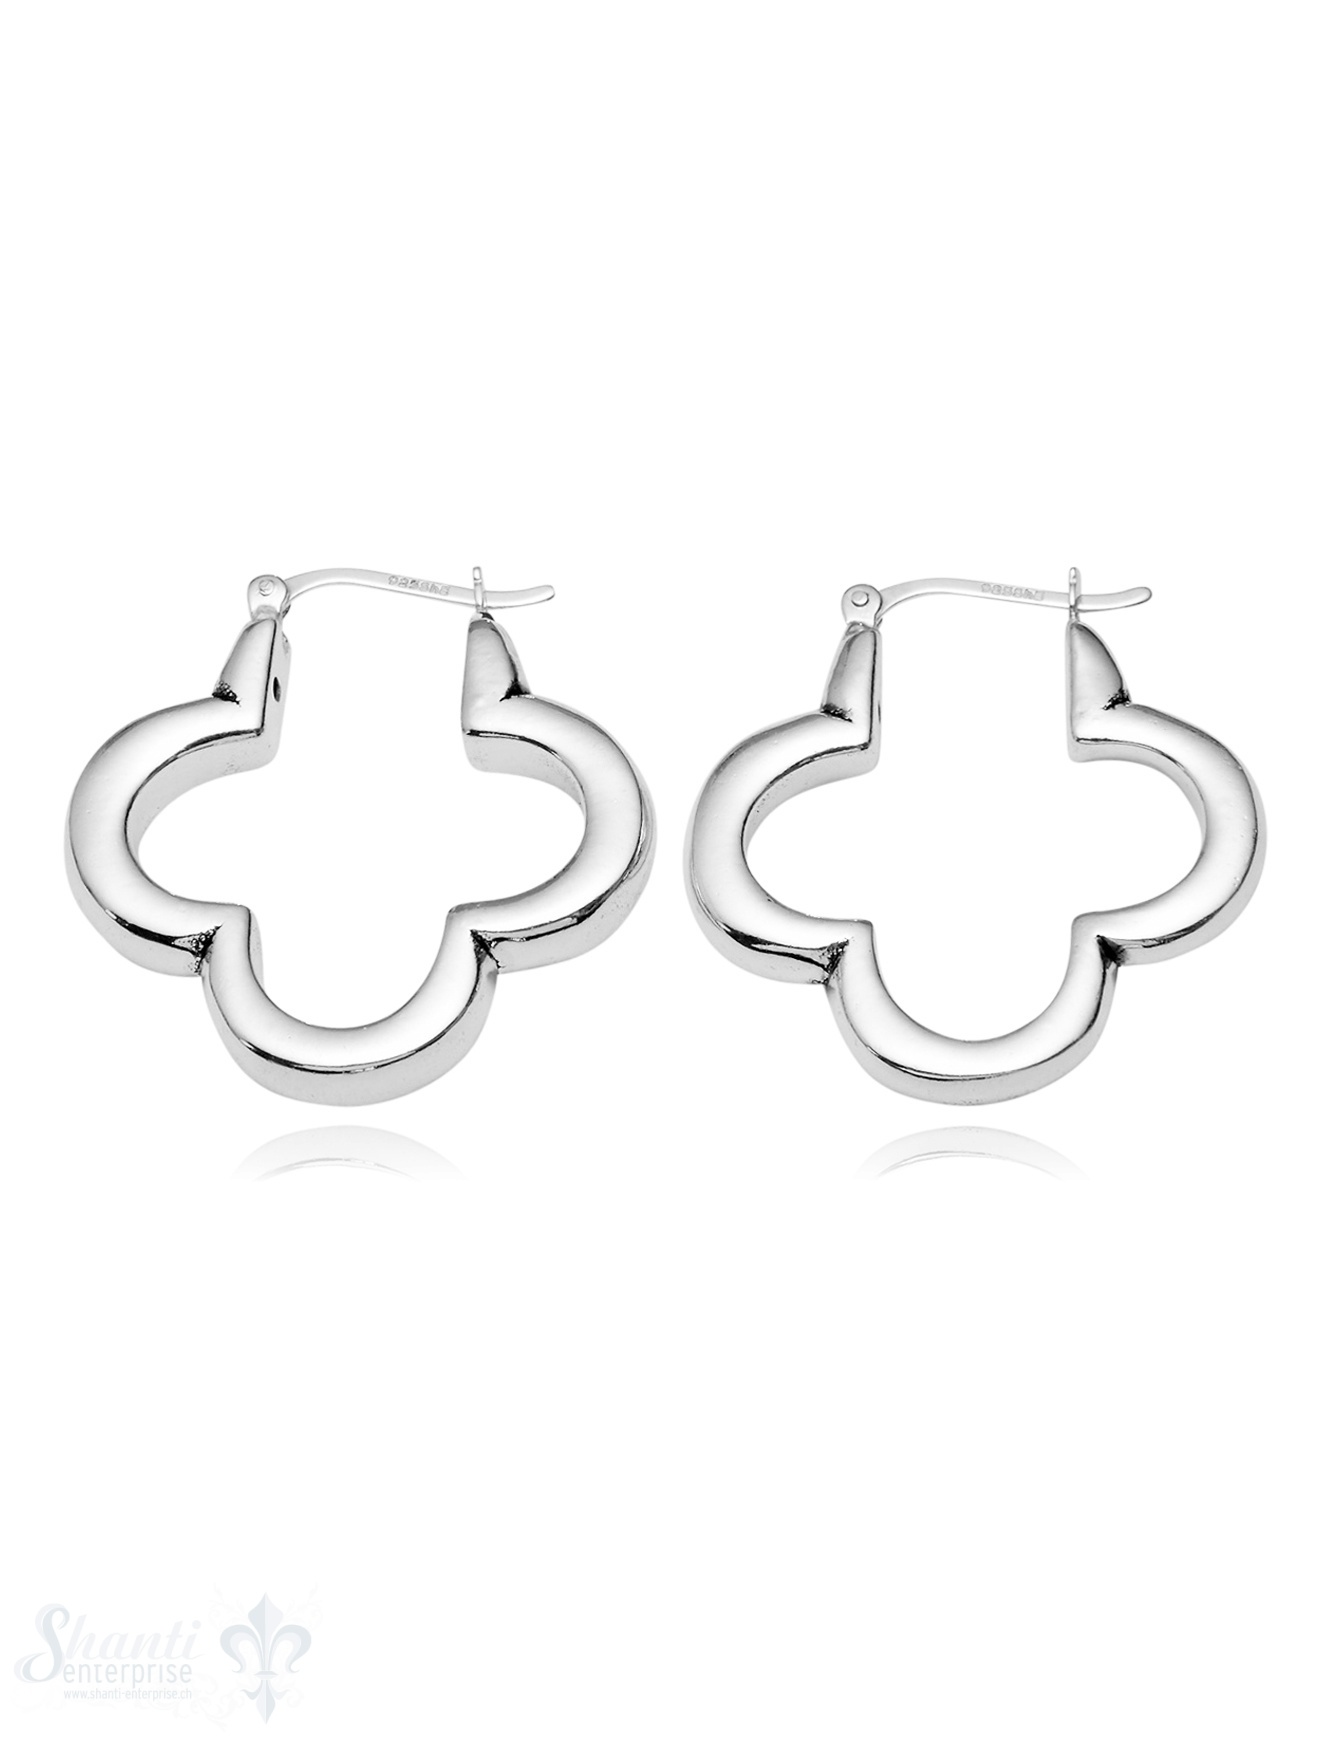 Ohrhänger Silber Blumen-Rahmen vierblättrig 5 mm